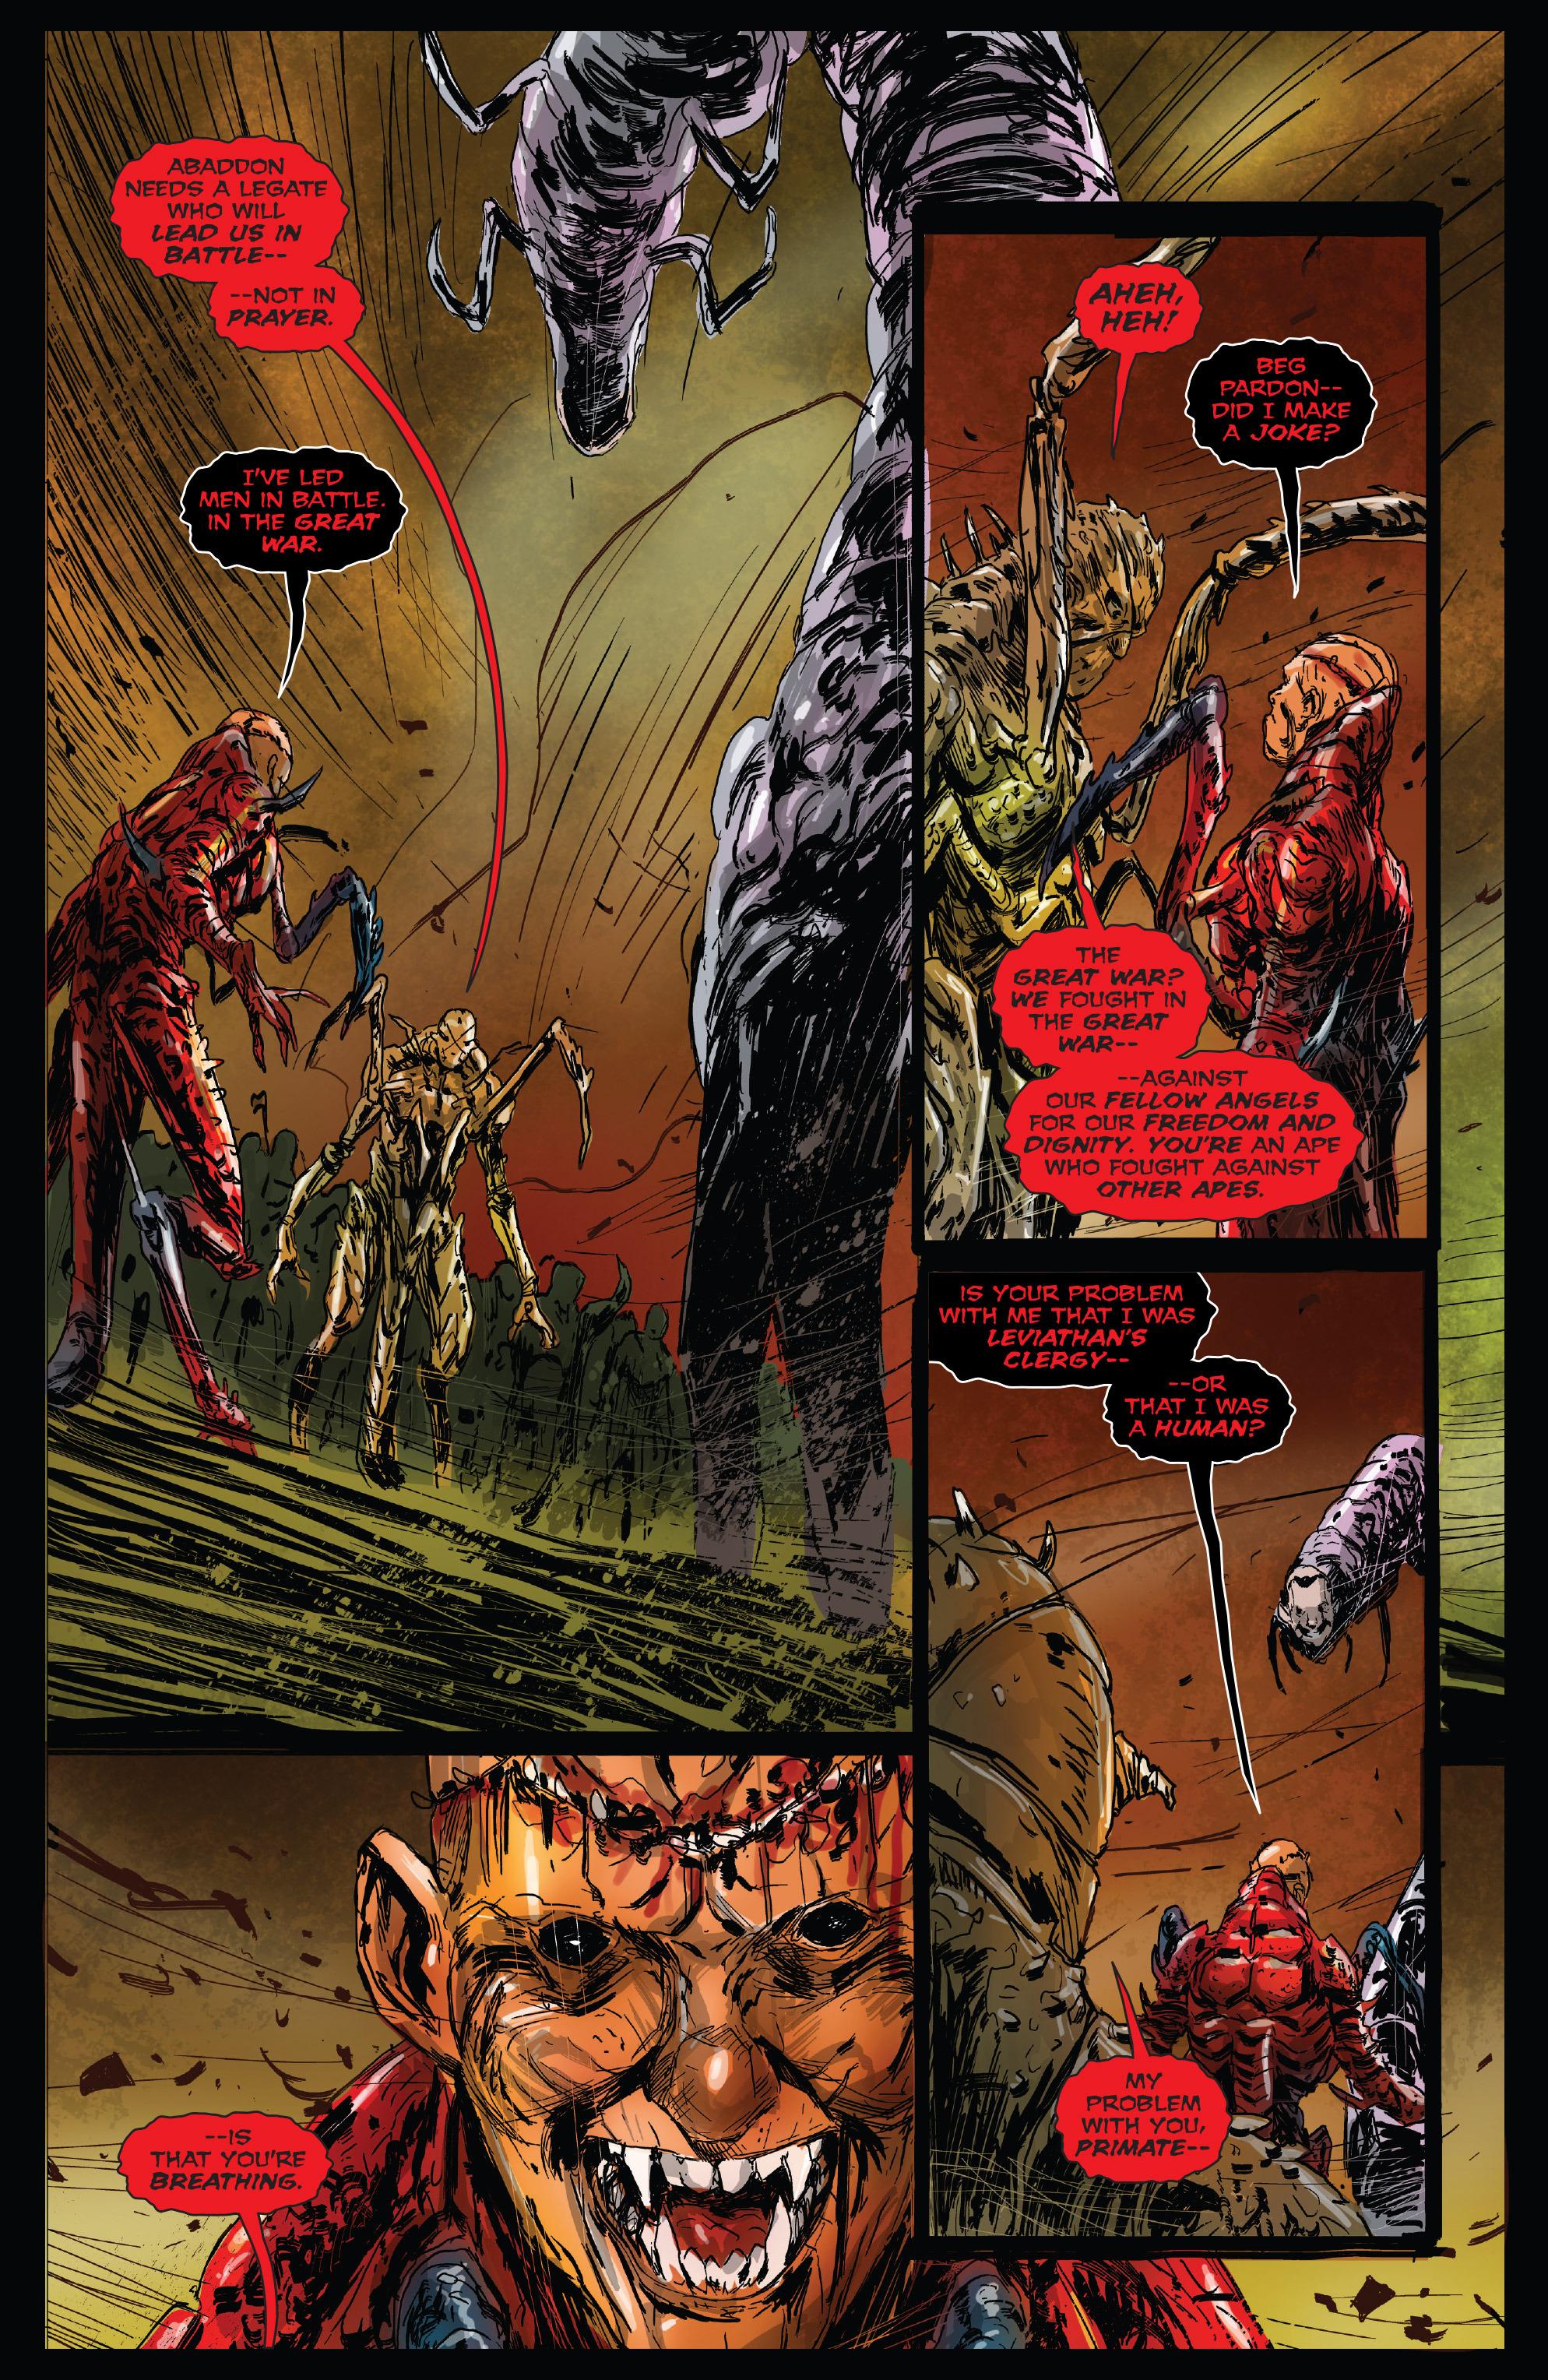 Read online Clive Barker's Hellraiser: The Dark Watch comic -  Issue # TPB 3 - 8